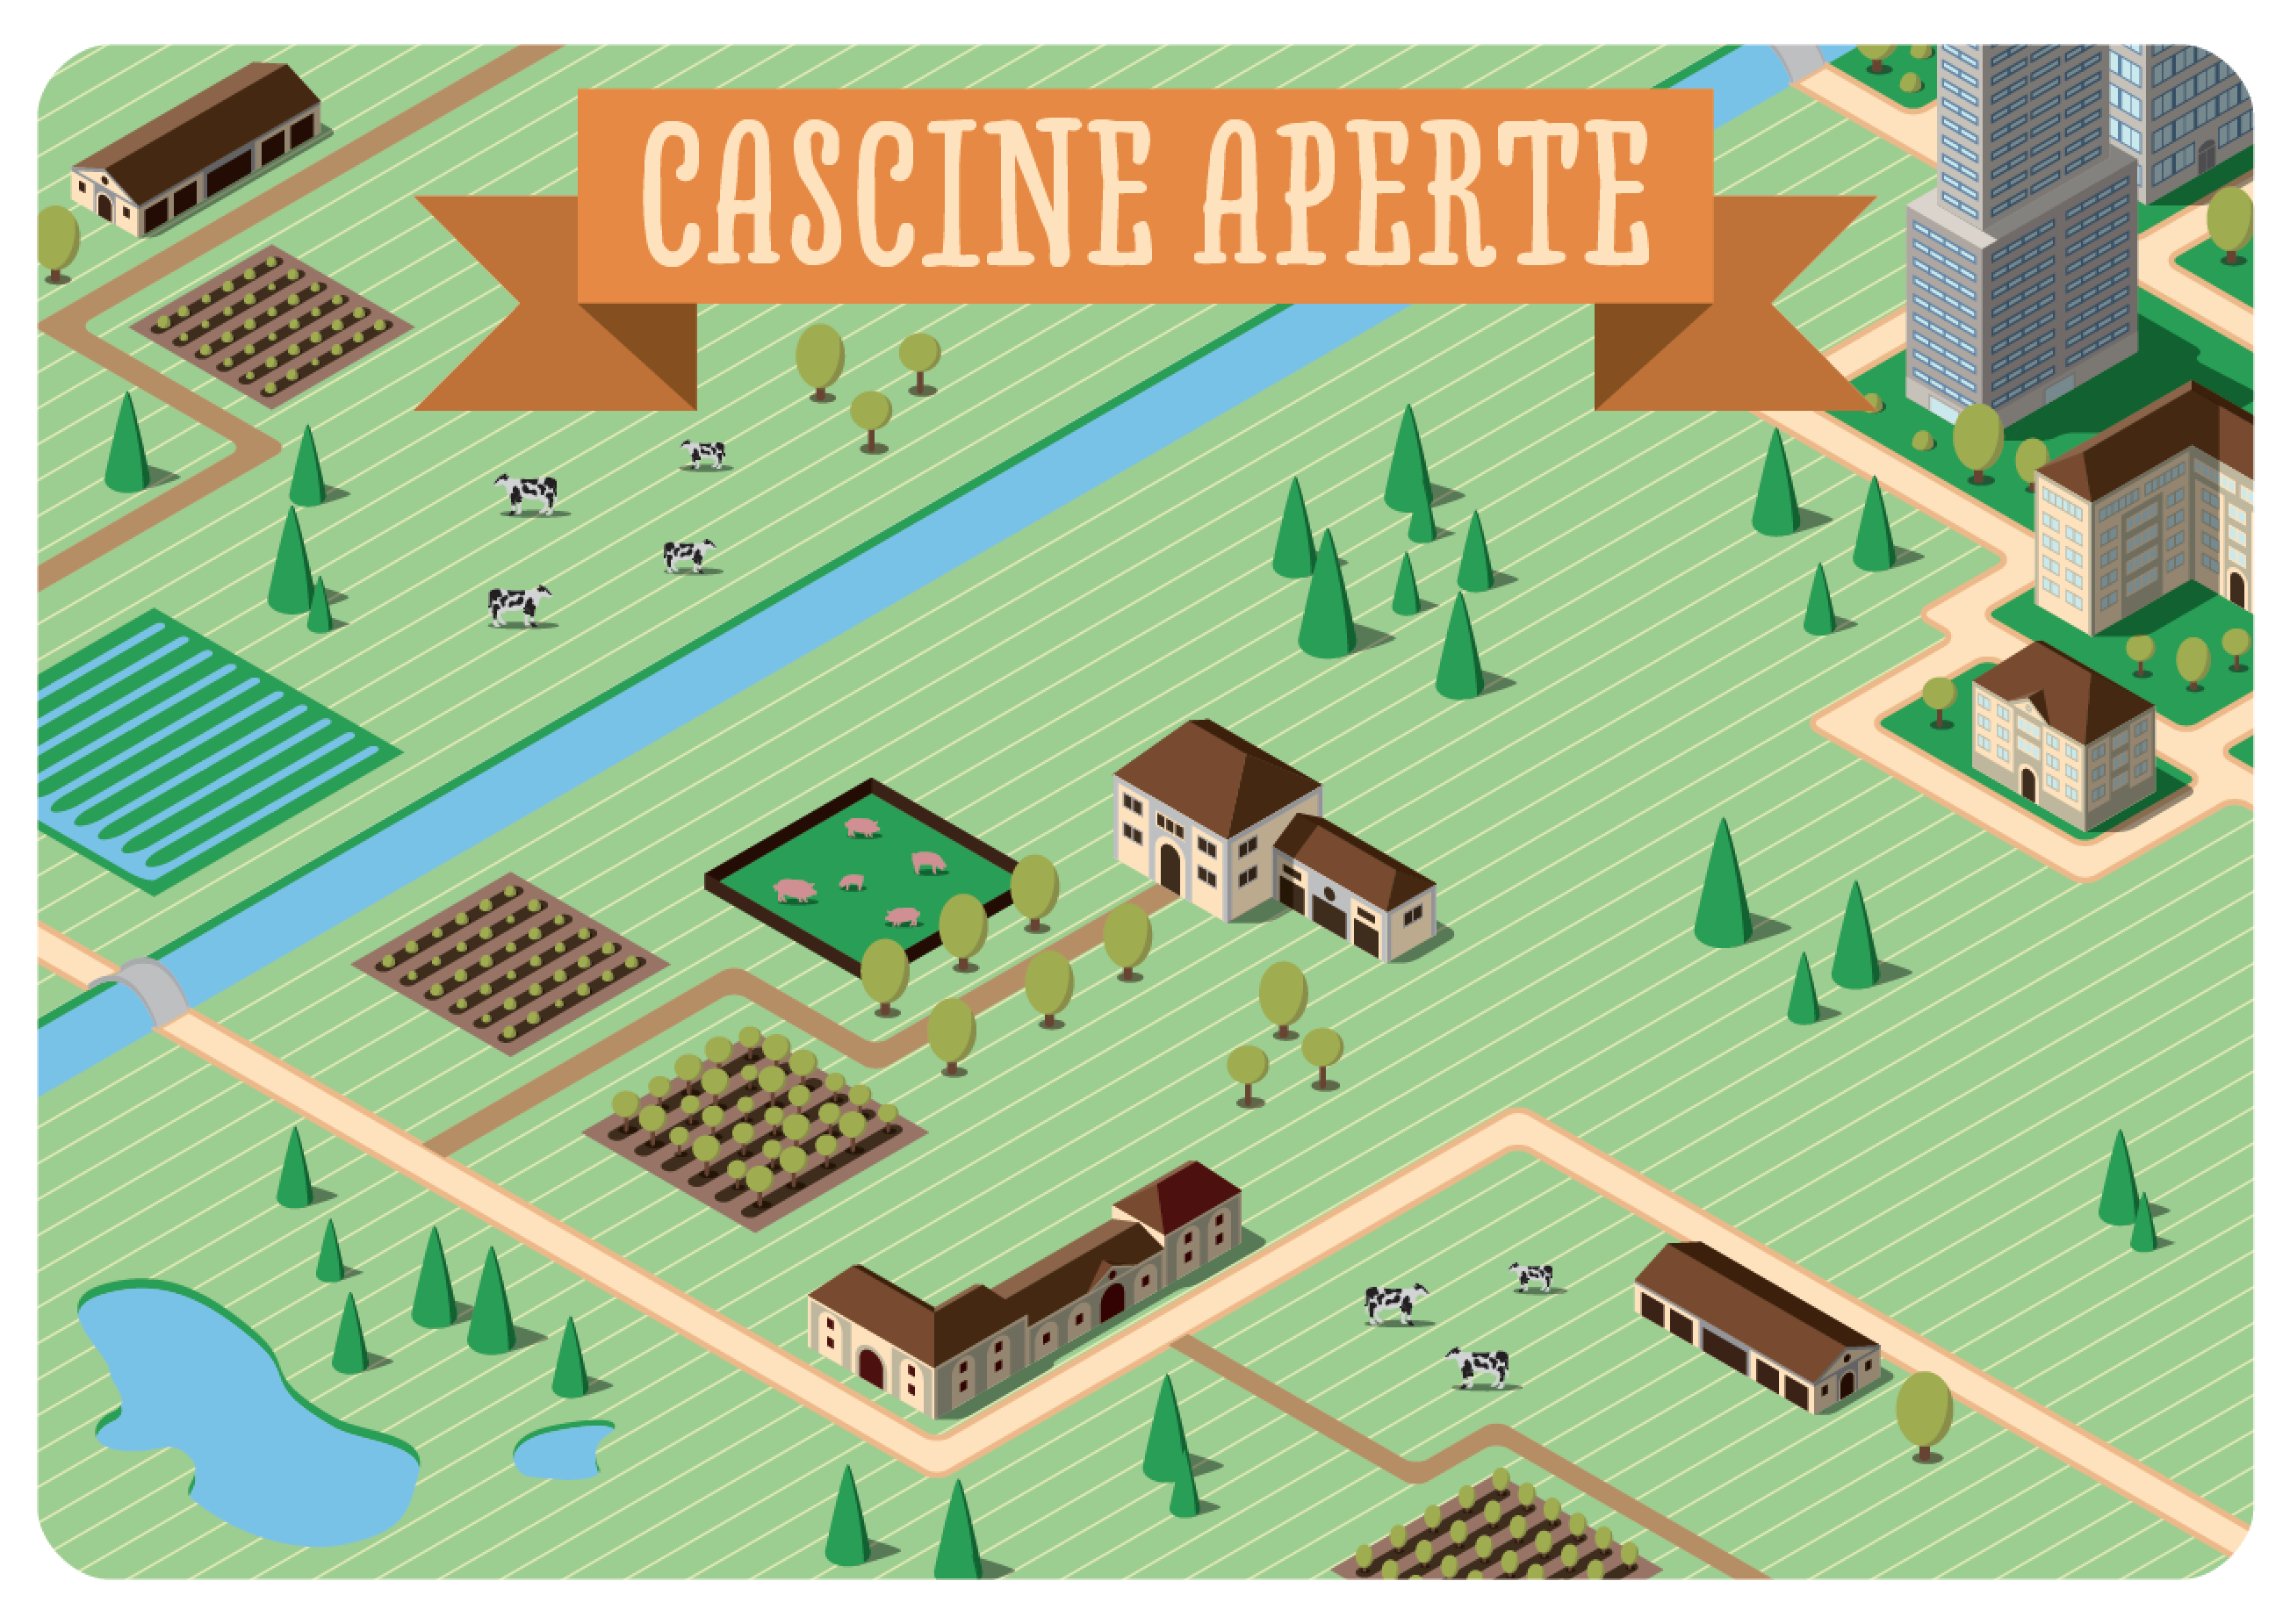 Cascine Aperte 2018 Milano